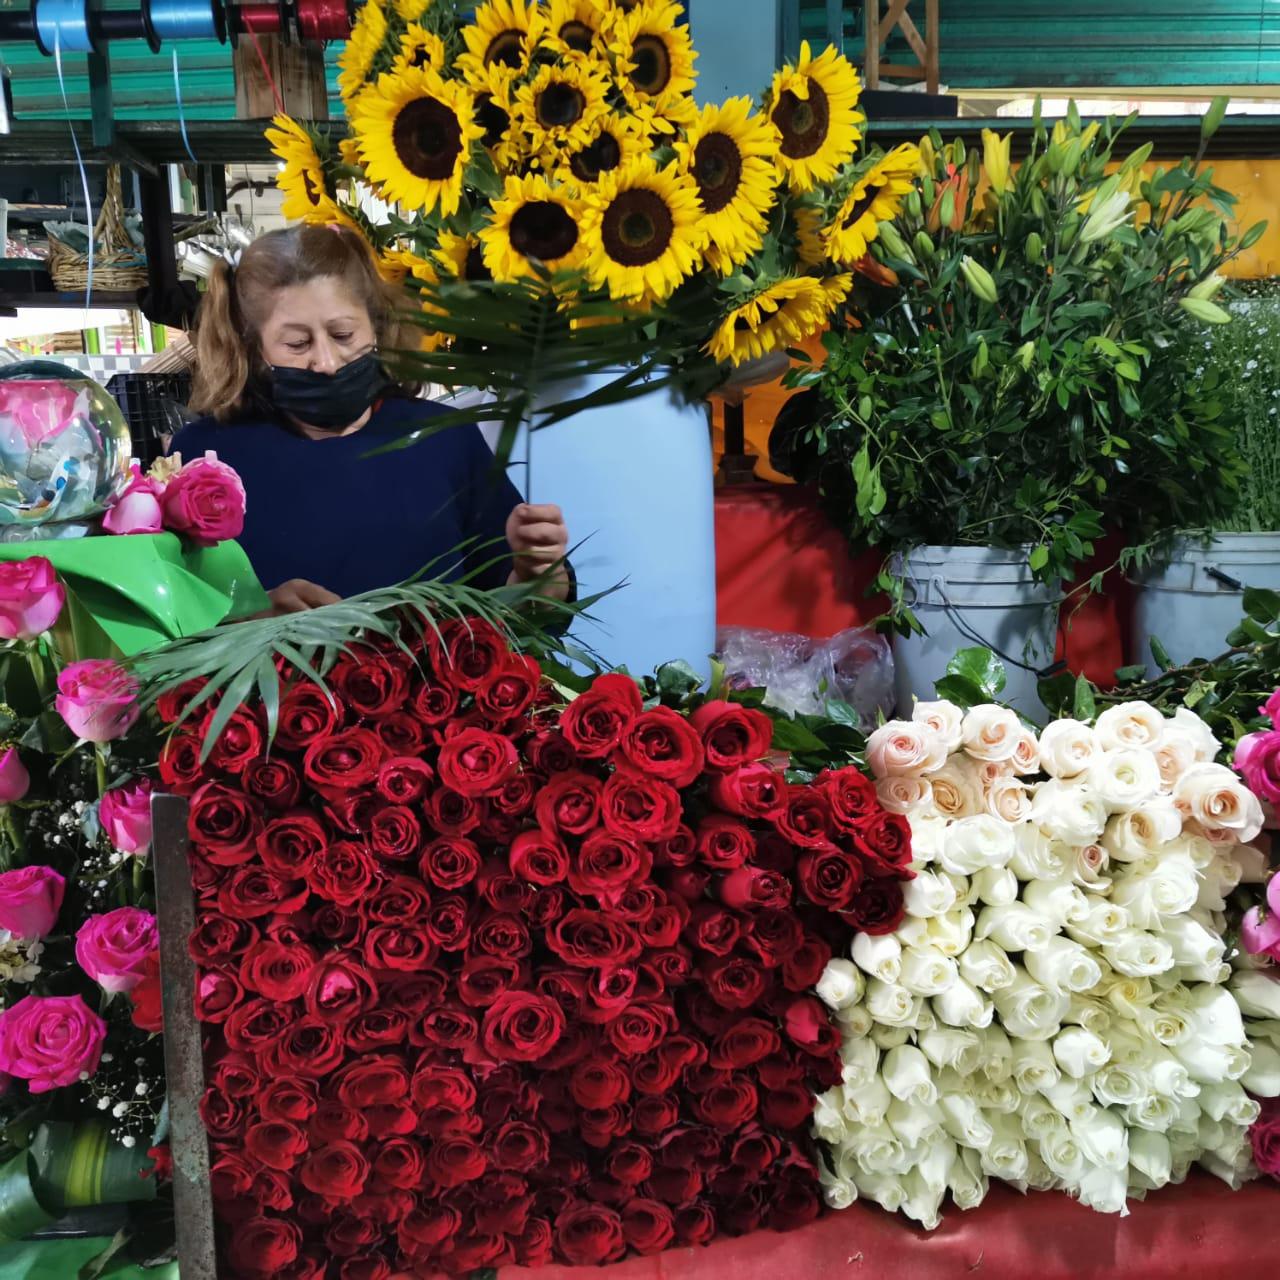 MEXIQUENSES BUSCAN FLORES PREVIO AL DÍA DE LAS MADRES